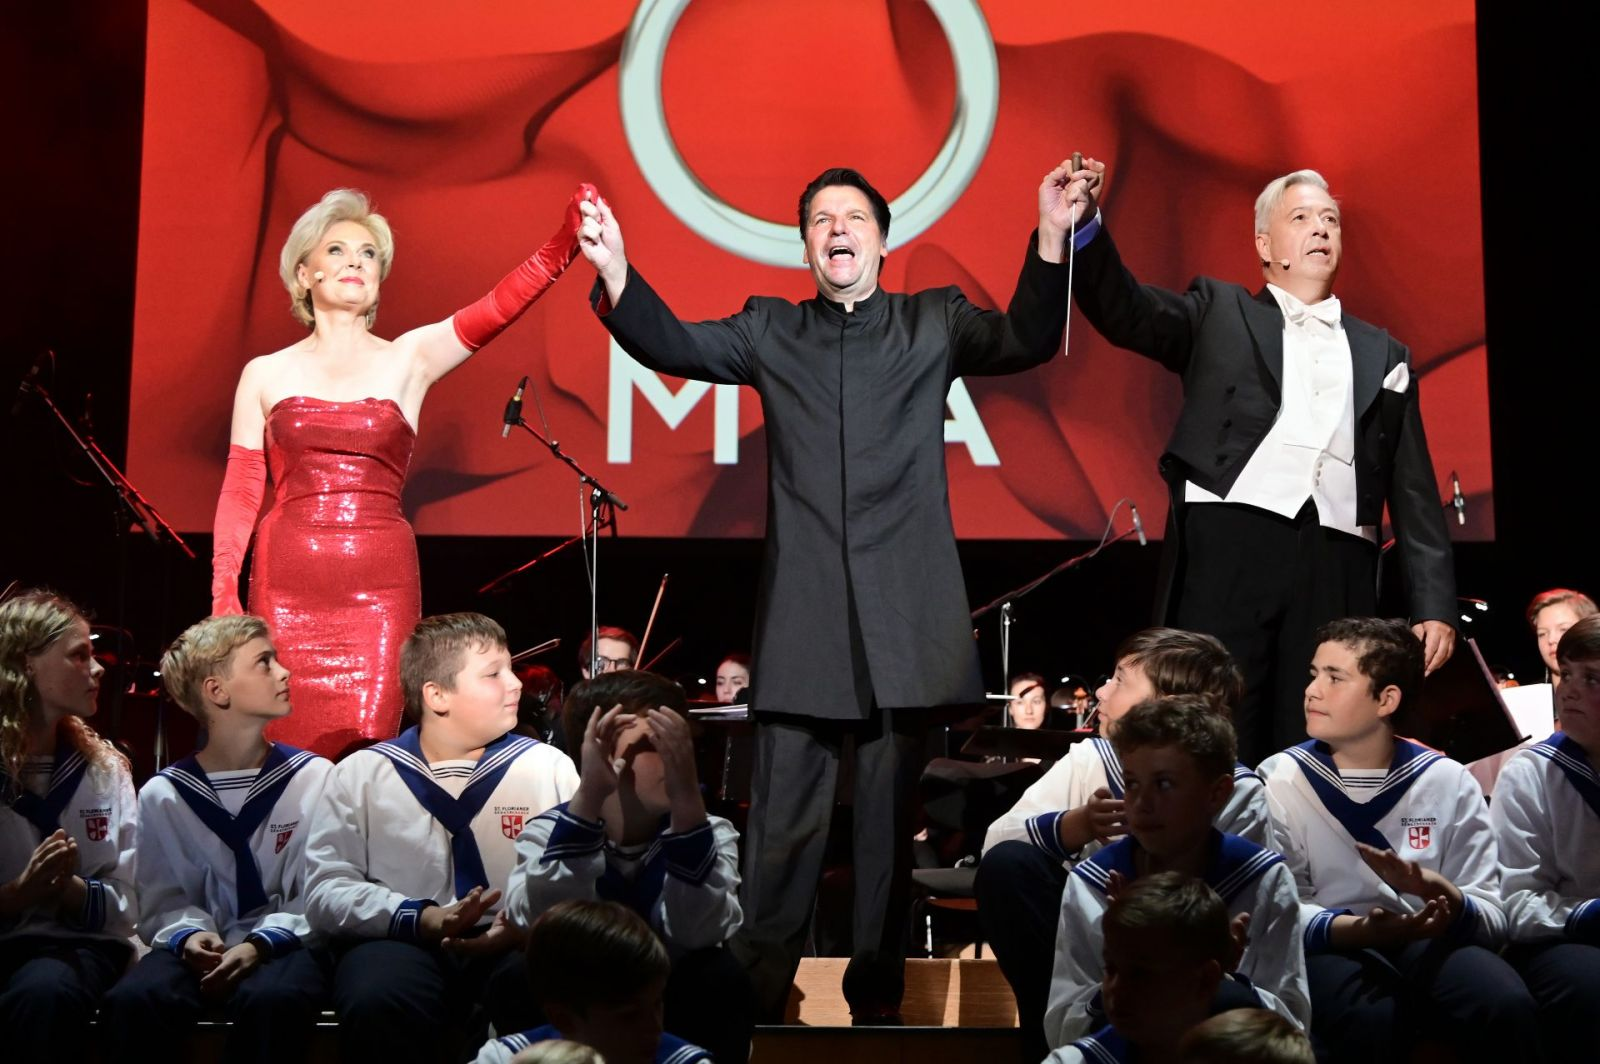 O-mia Wiener Konzerthaus 2019